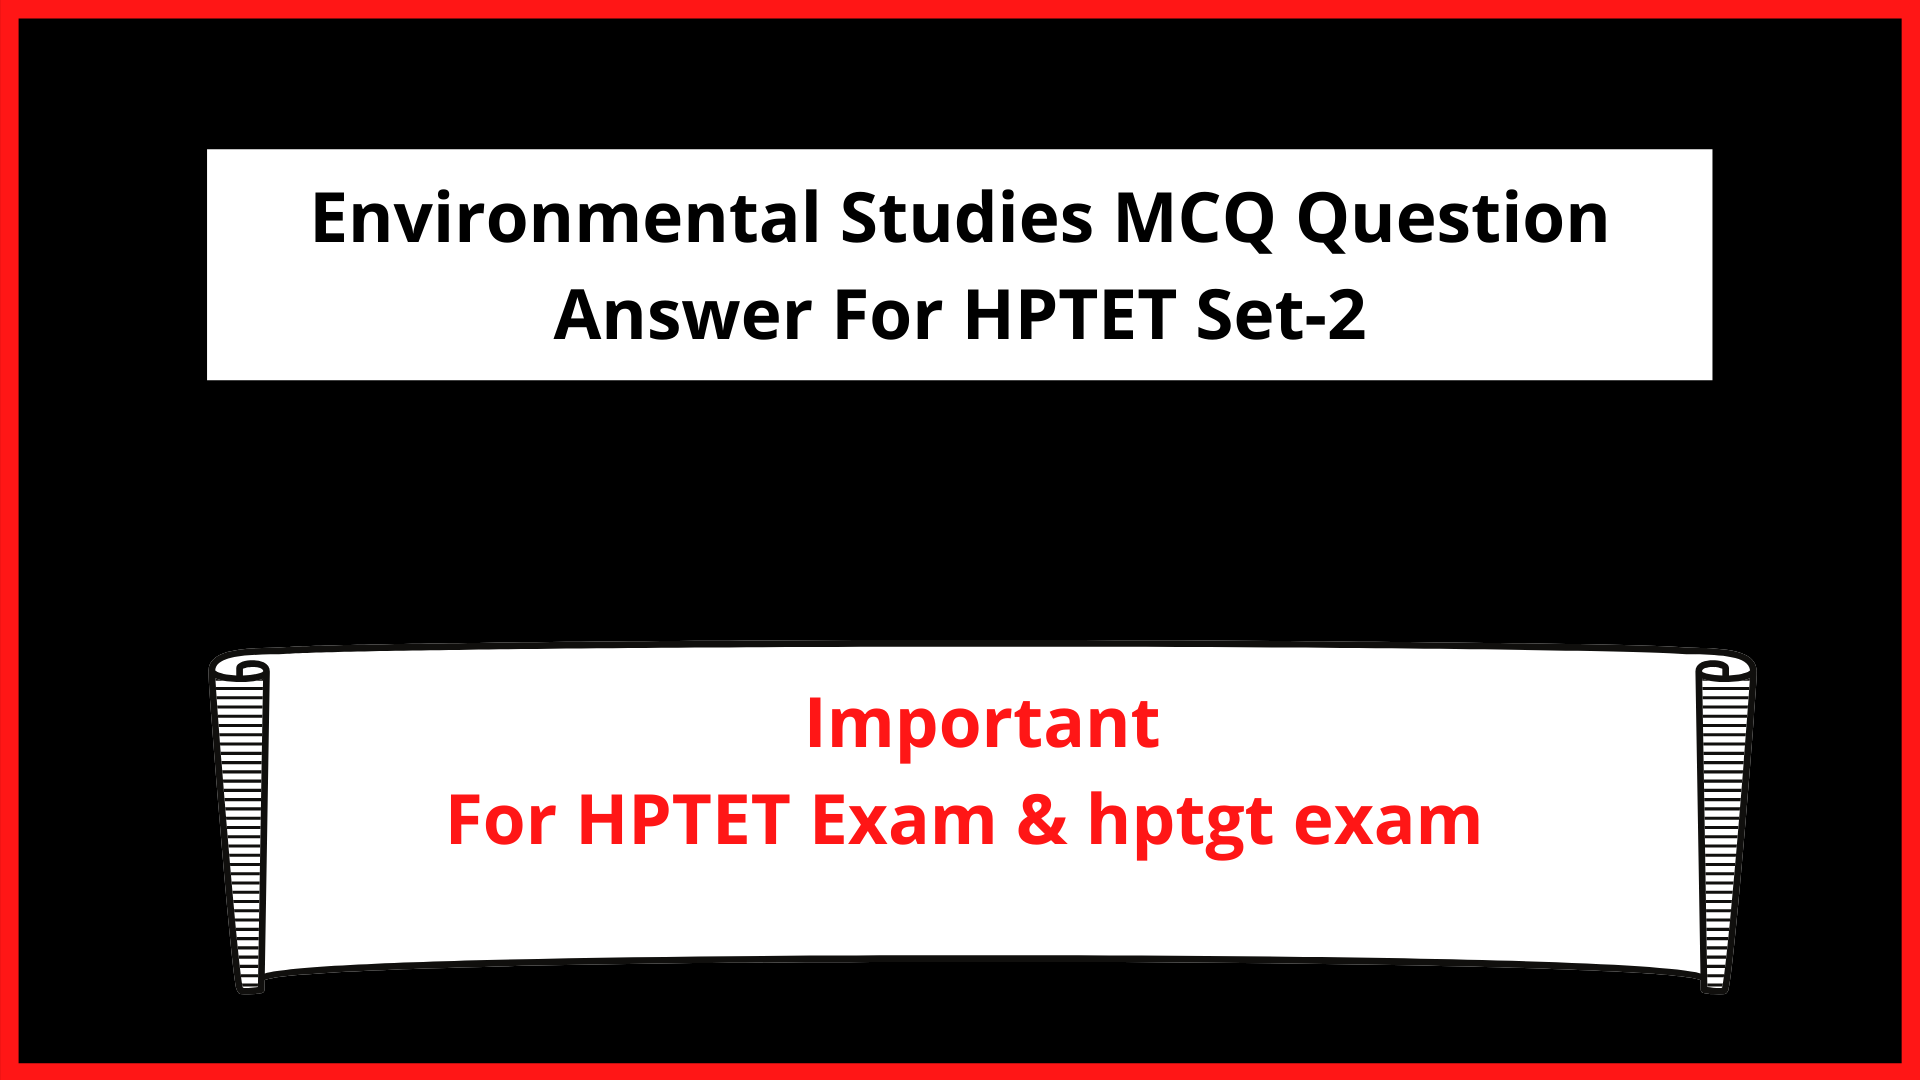 Environmental Studies MCQ Question Answer For HPTET Set-2